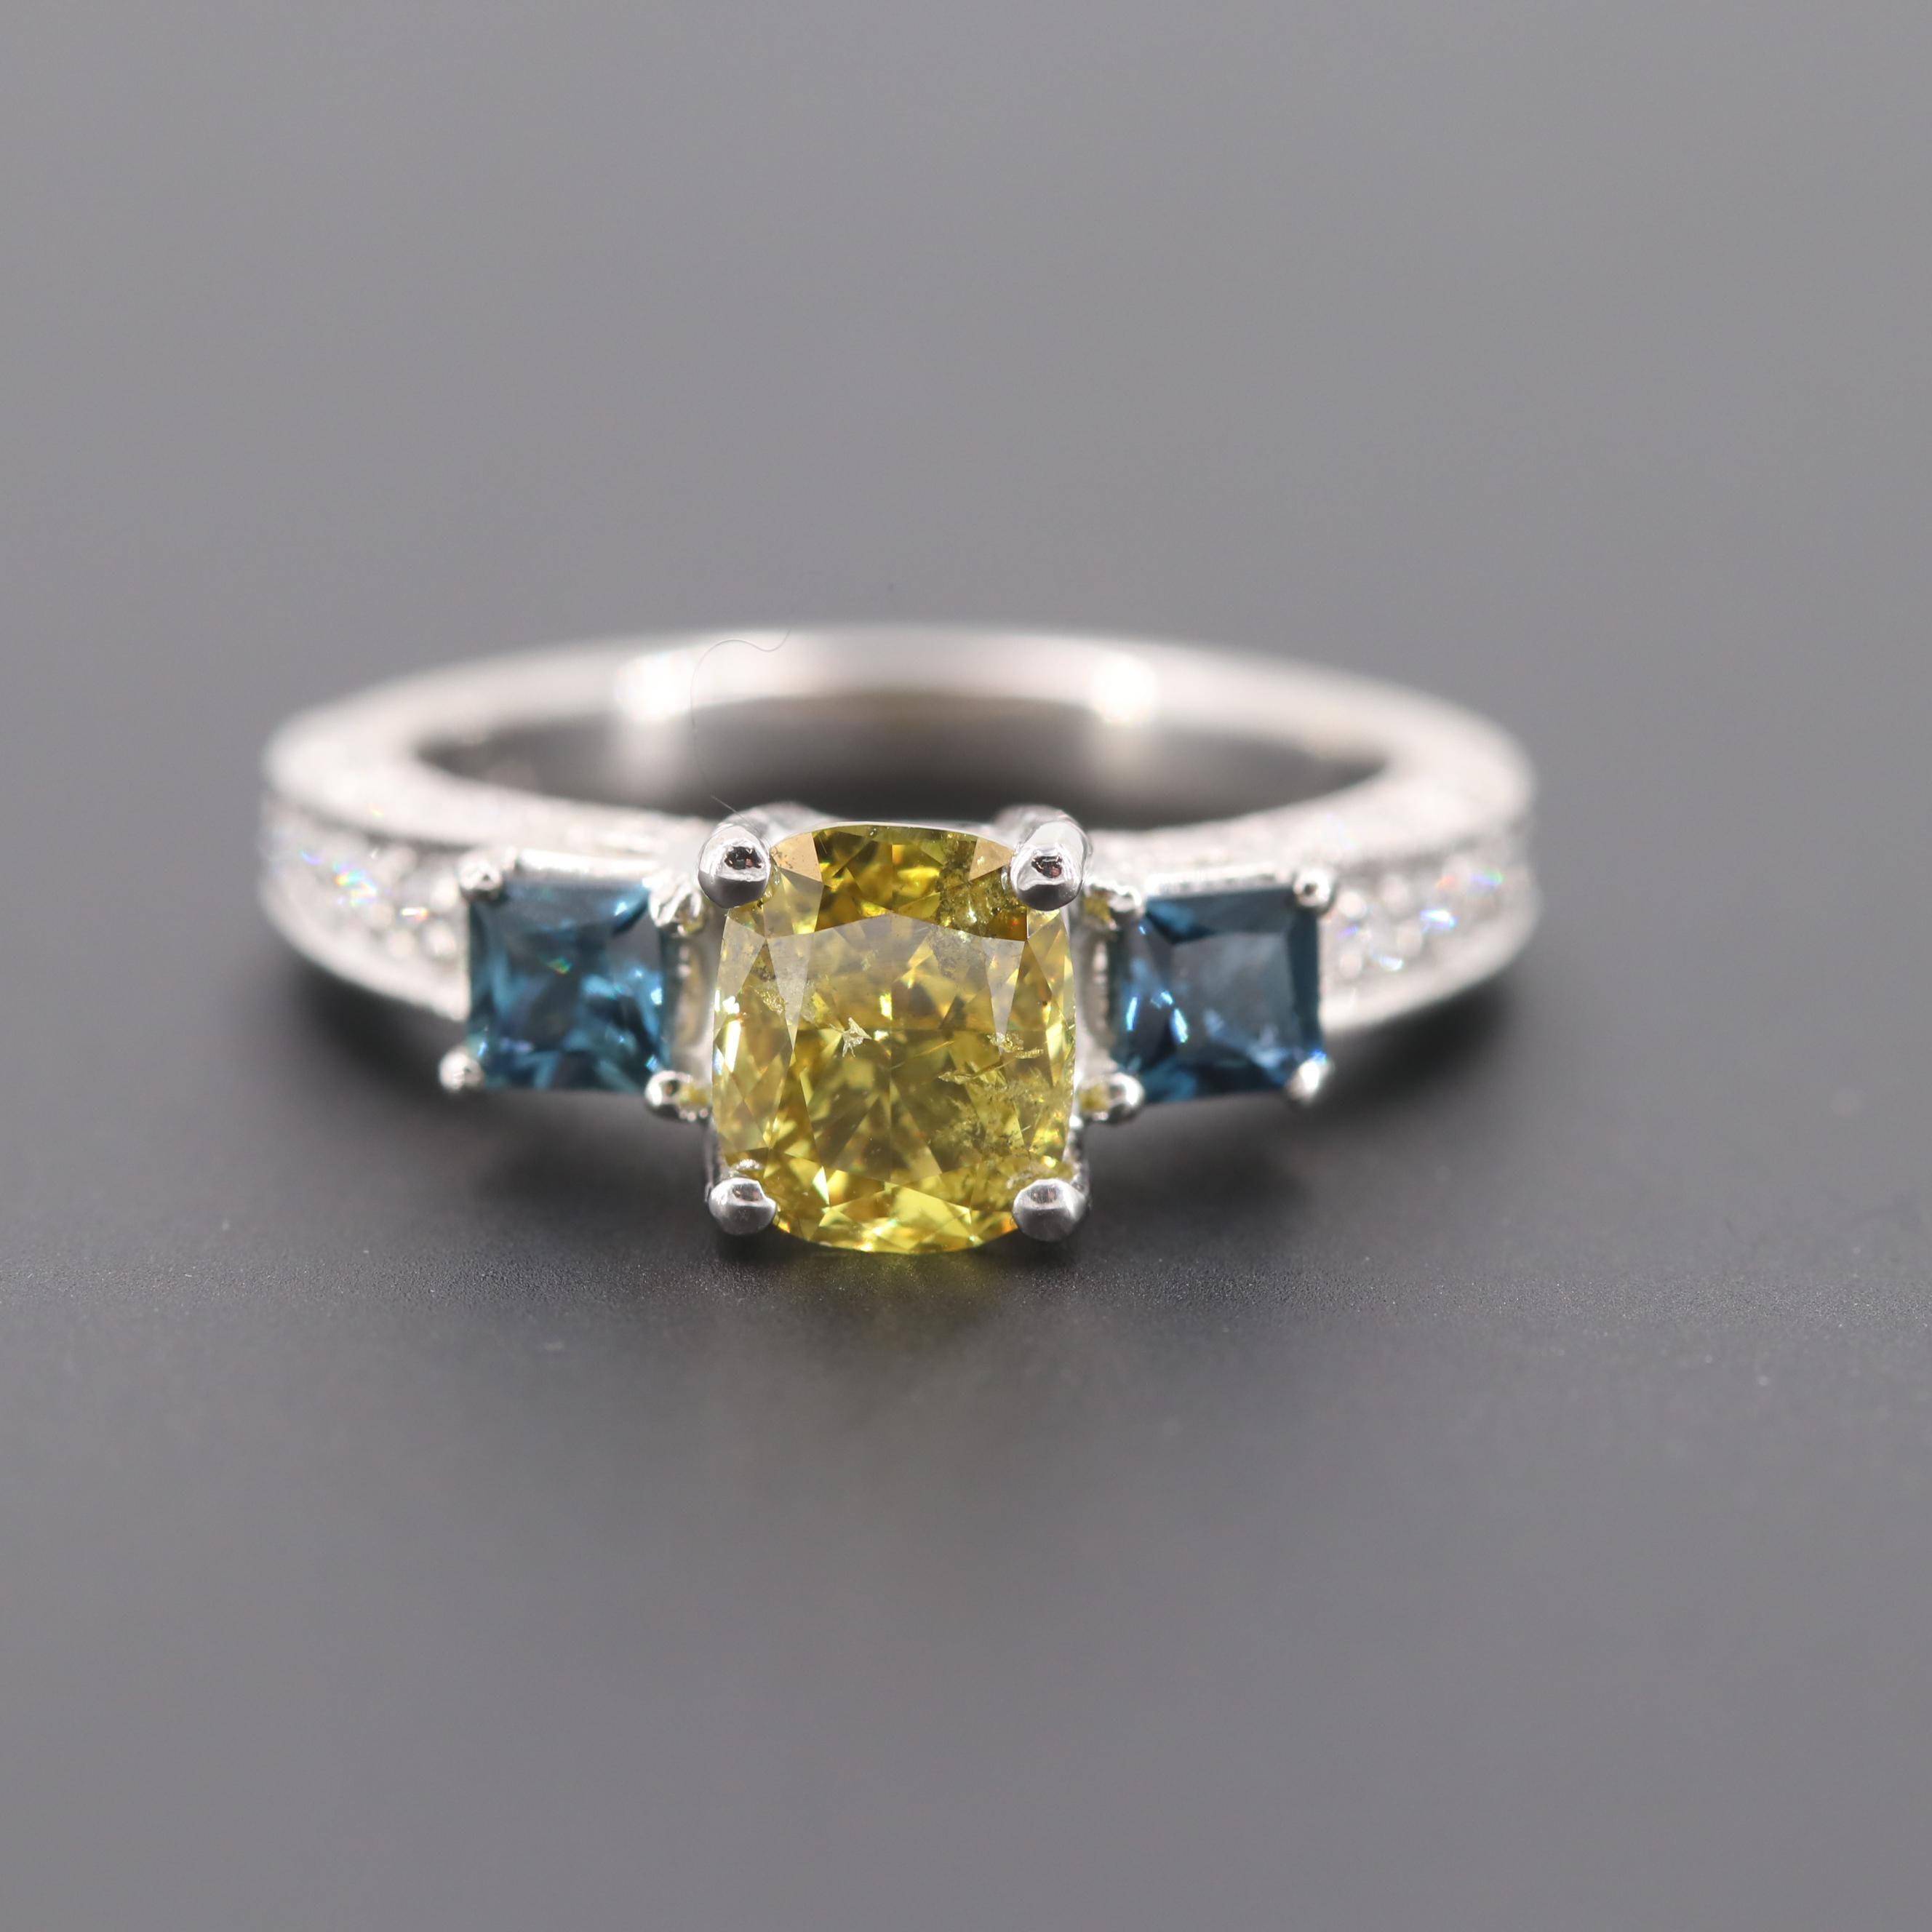 Platinum 1.28 CTW Fancy Greenish Yellow Diamond & Sapphire Ring with GIA Report